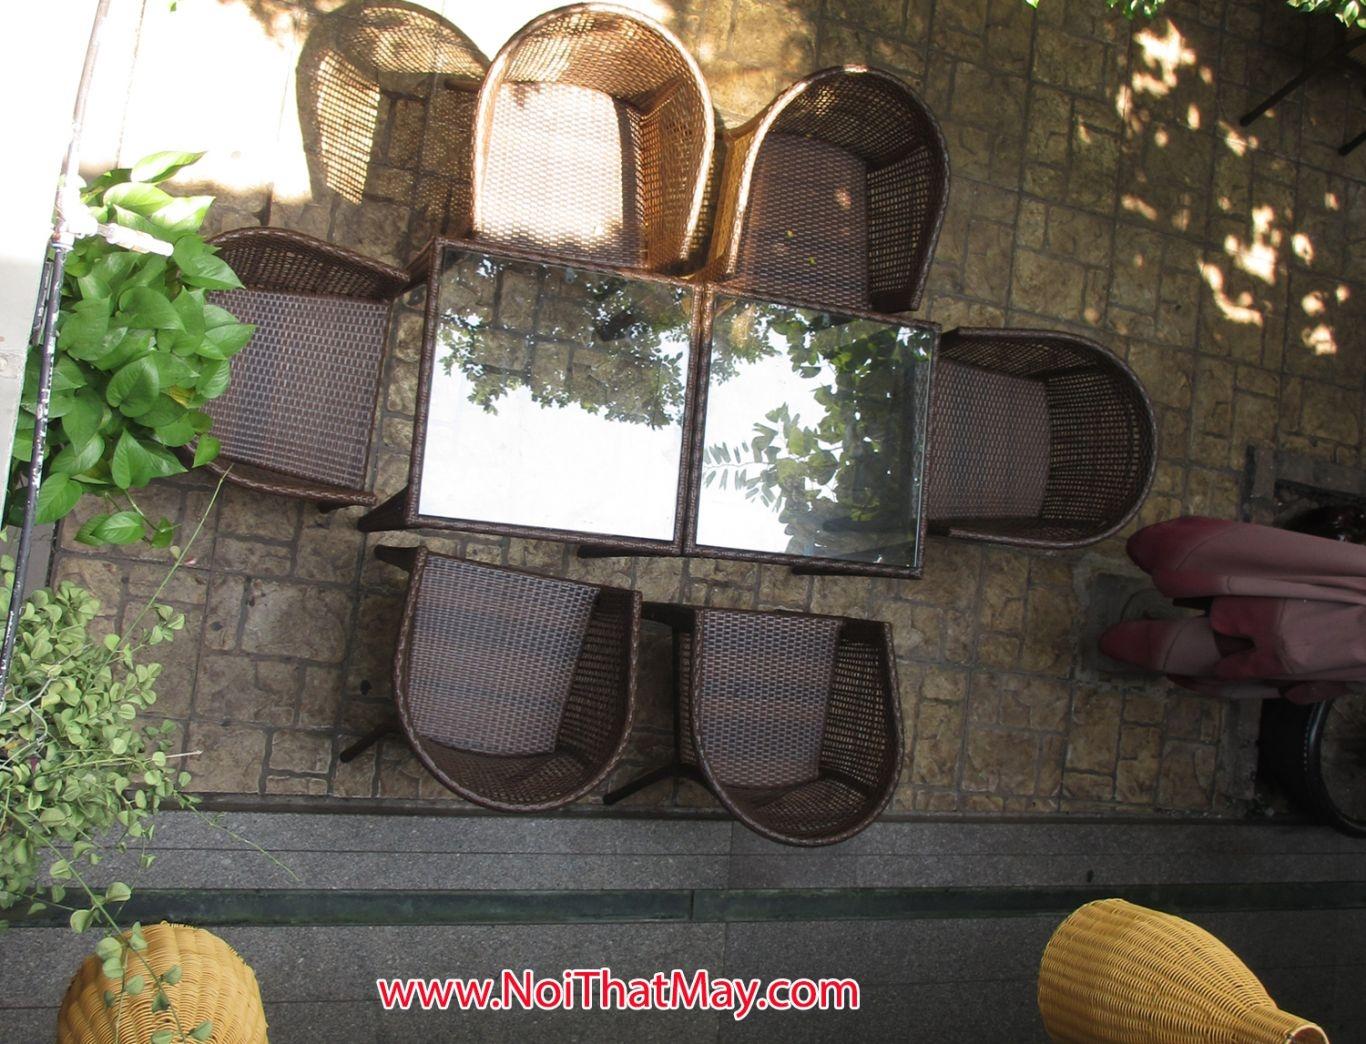 Outdoor wicker dining set